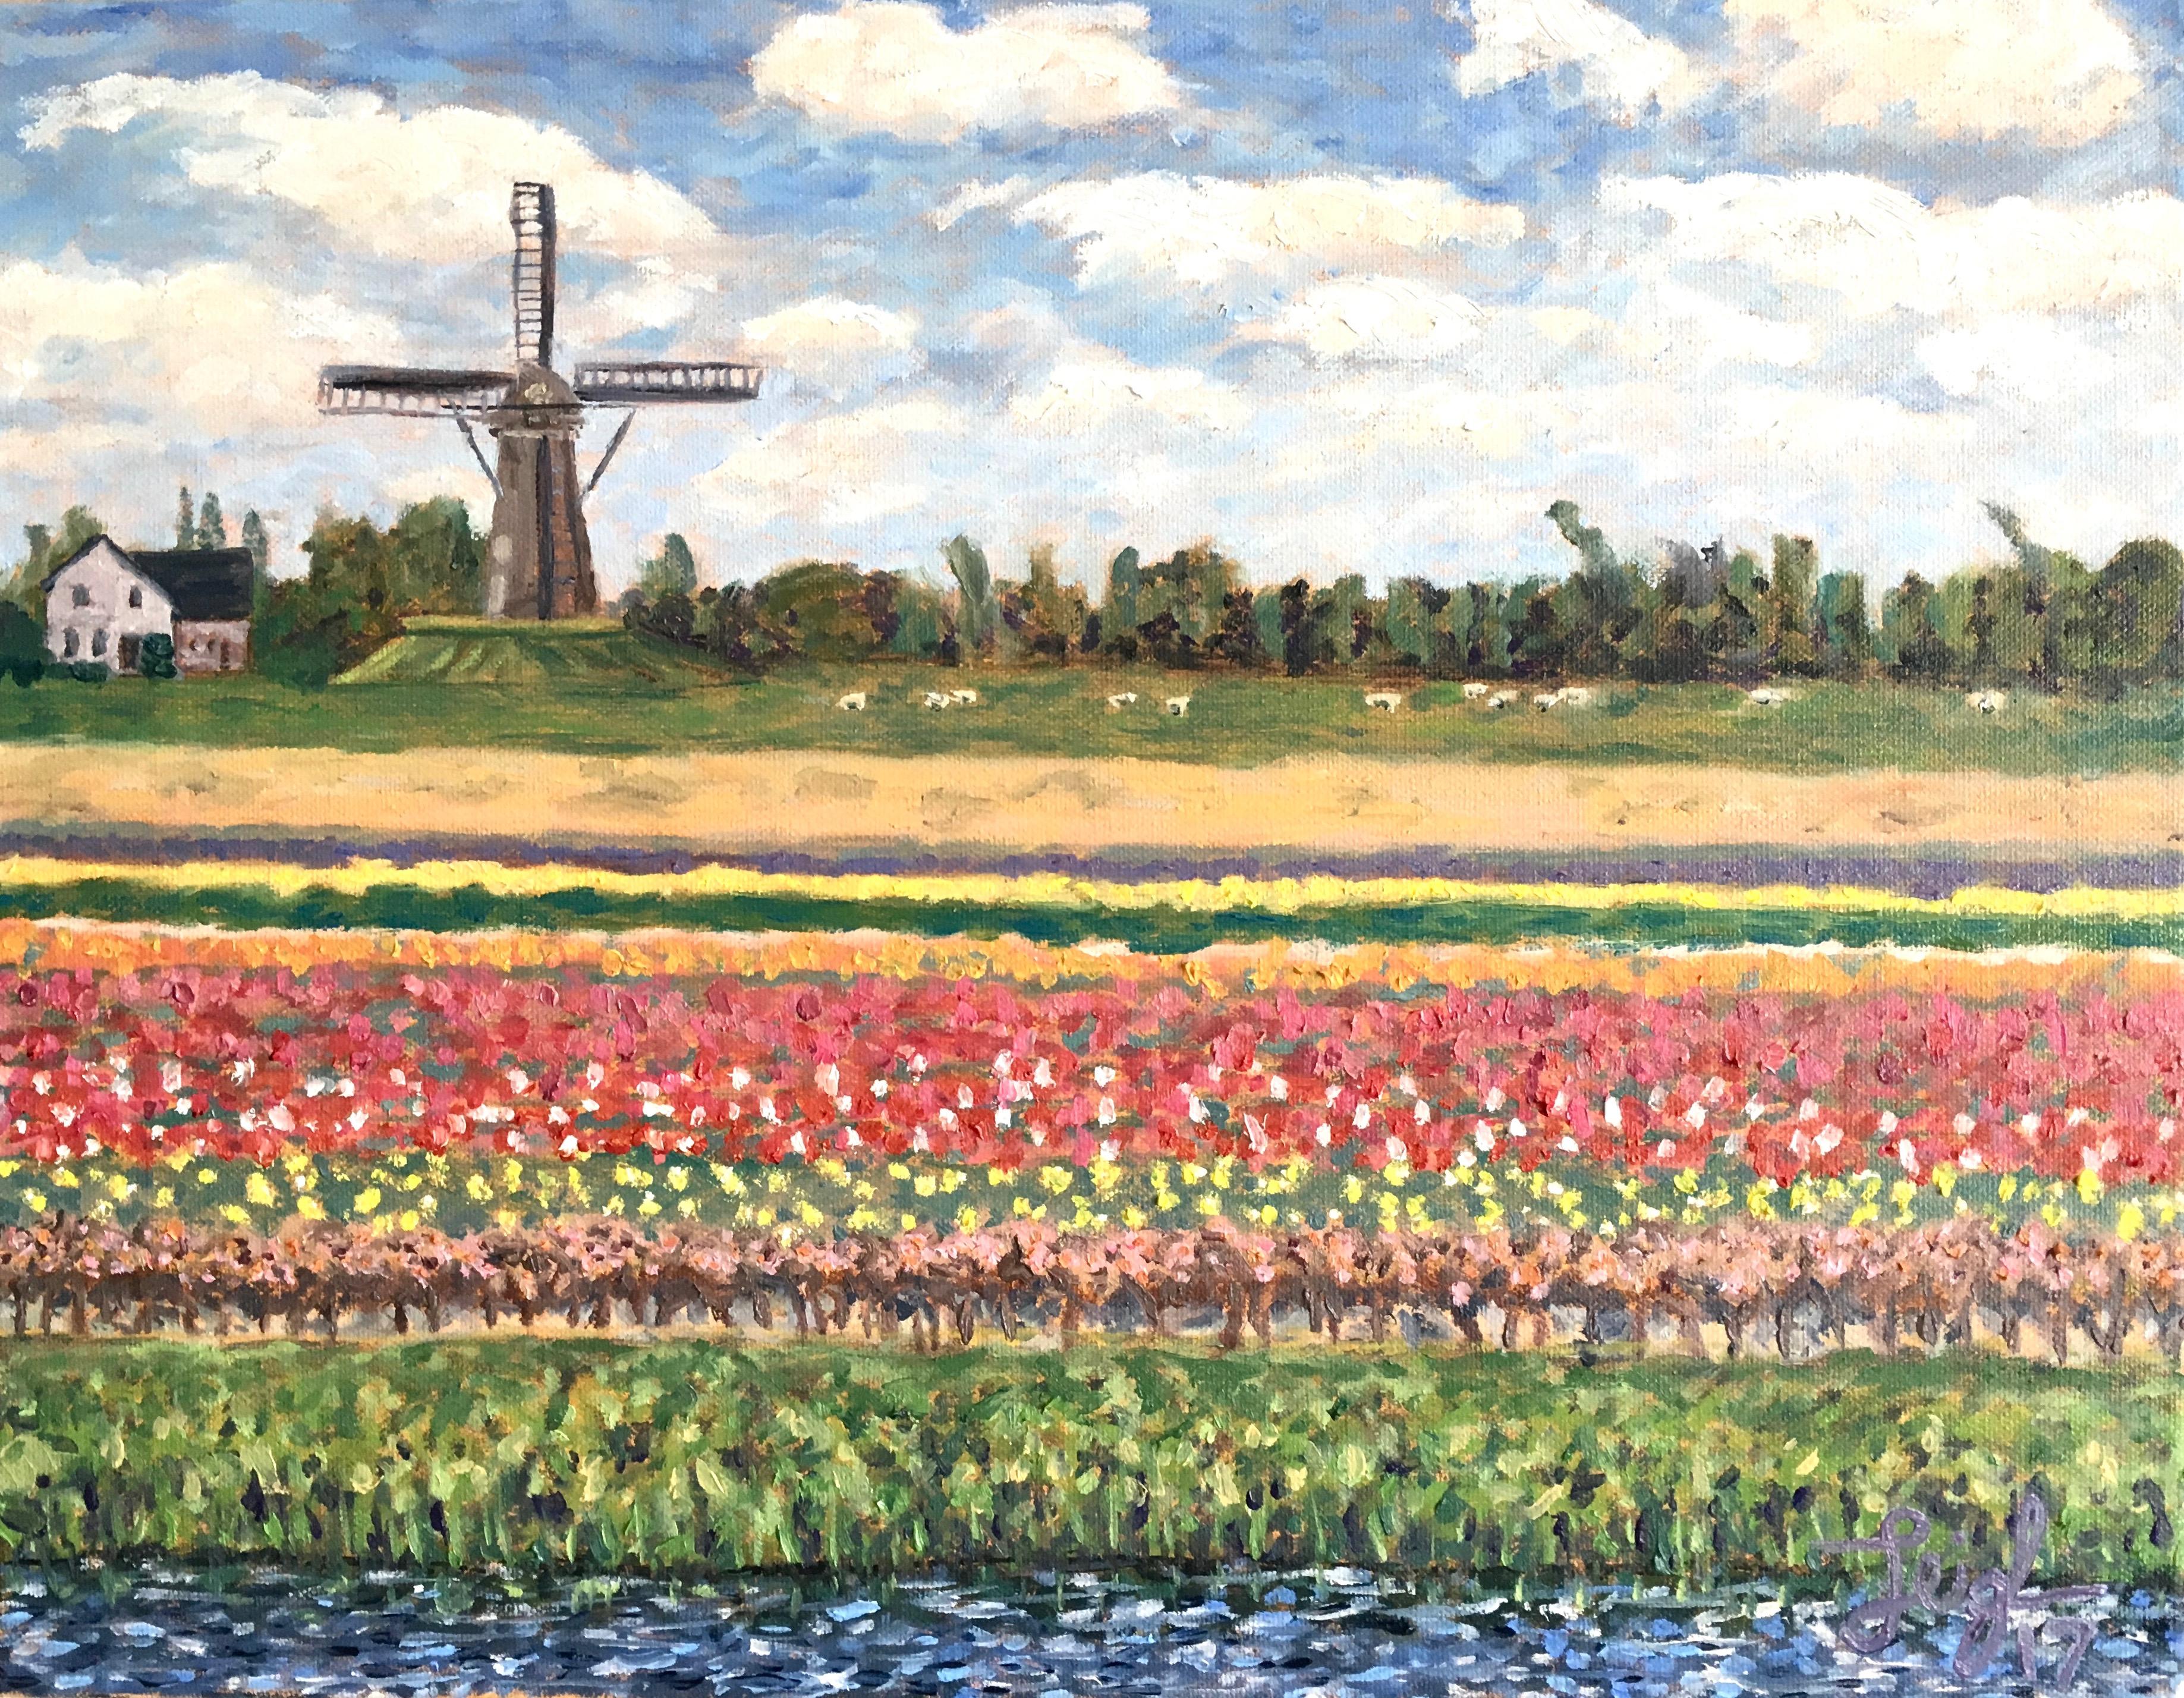 Flowers & Windmill  ~  Michelle & Alan Wolfson, Carlsbad, CA   2017  •  20 x 16